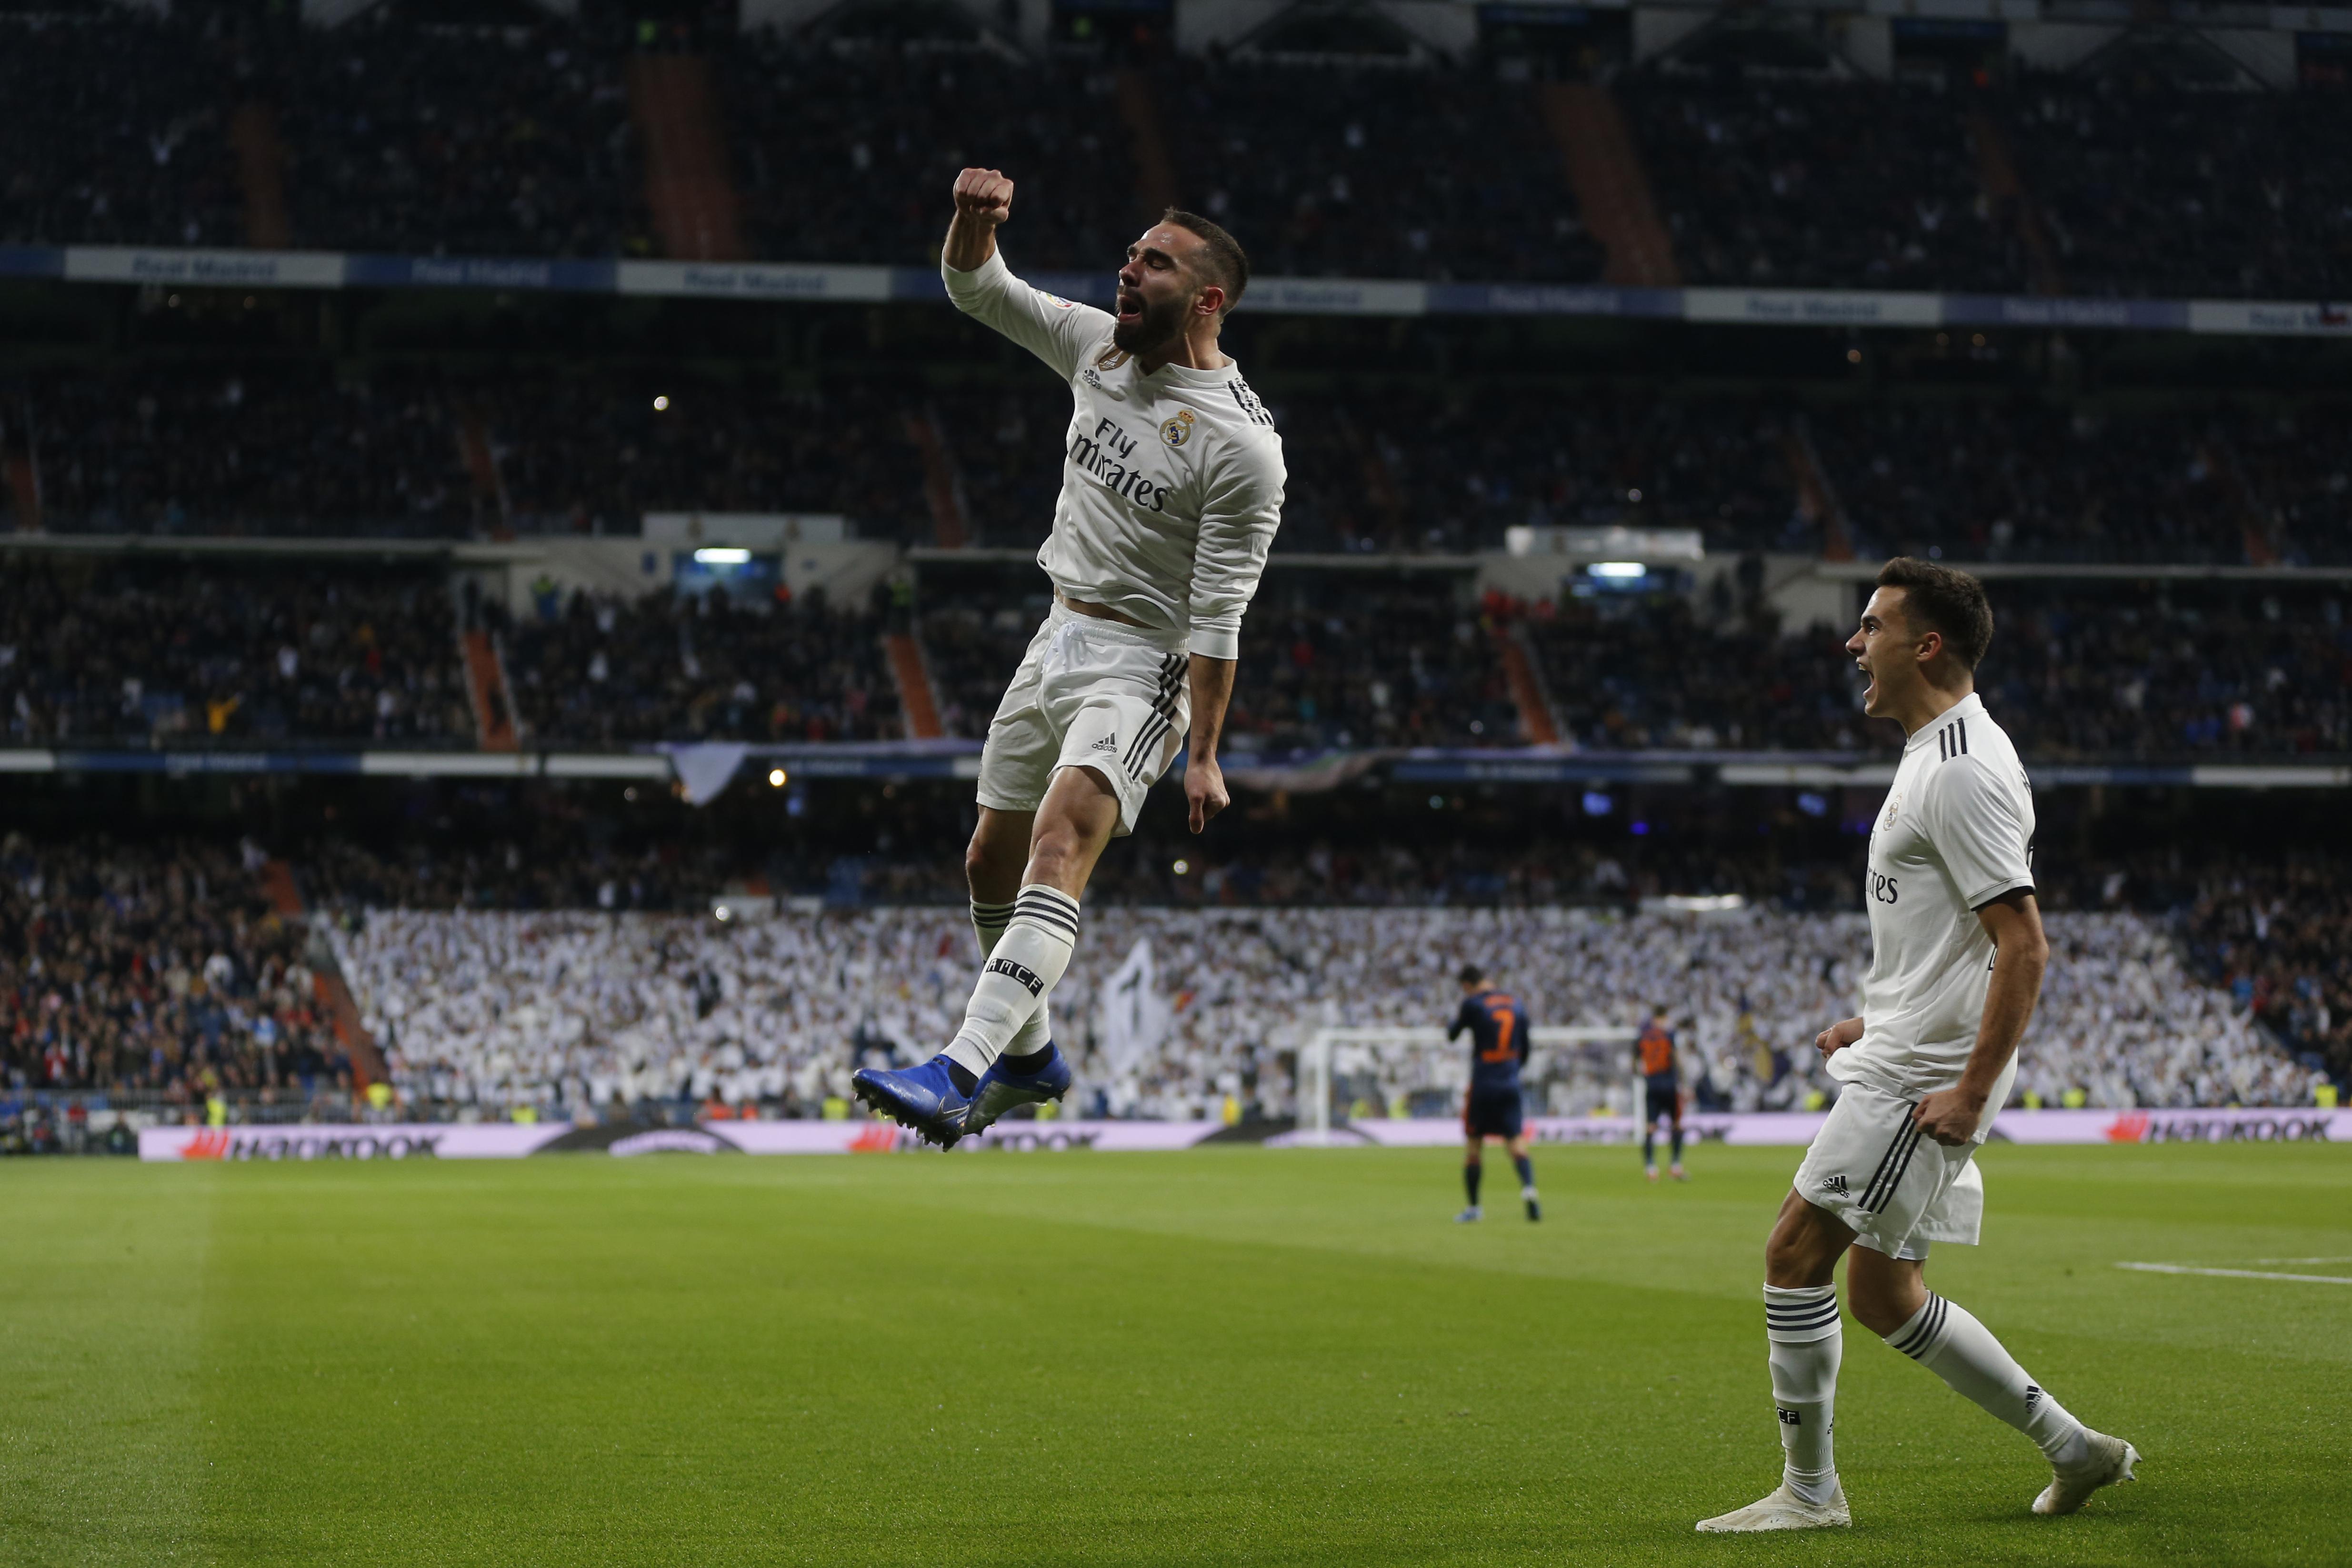 Aspas nets twice, puts Celta back on track in Spanish league